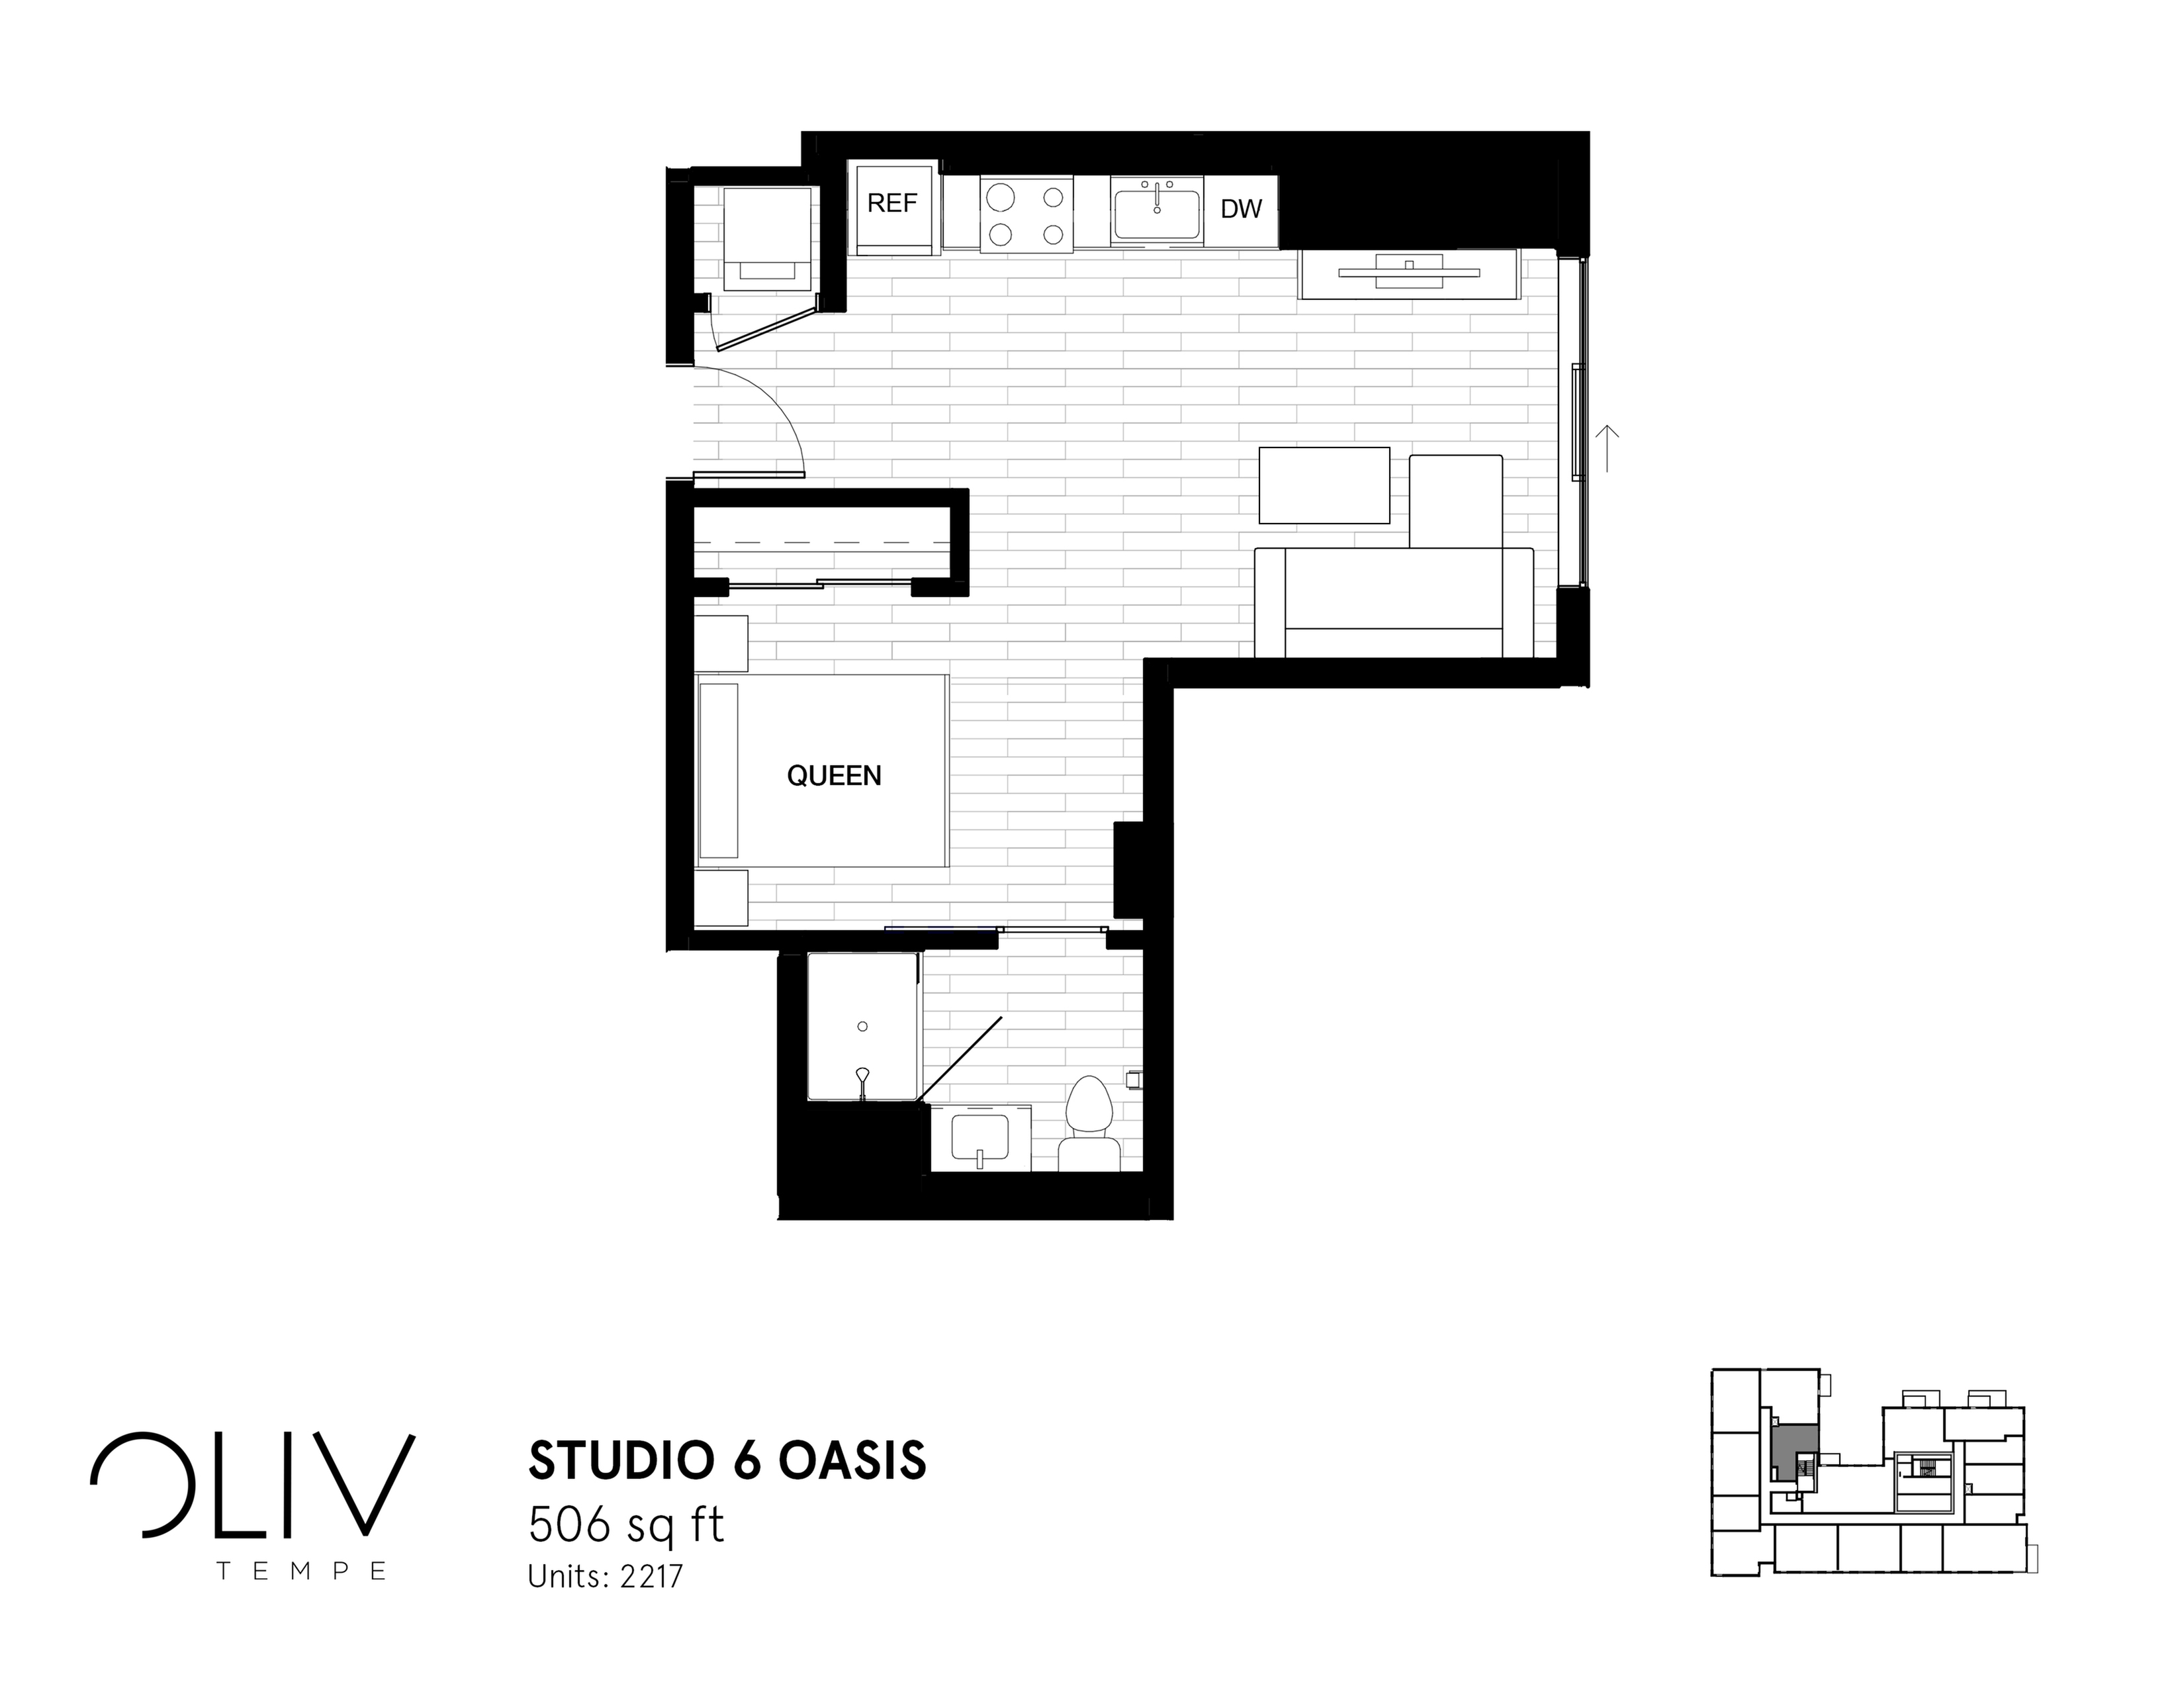 Studio 6 Oasis